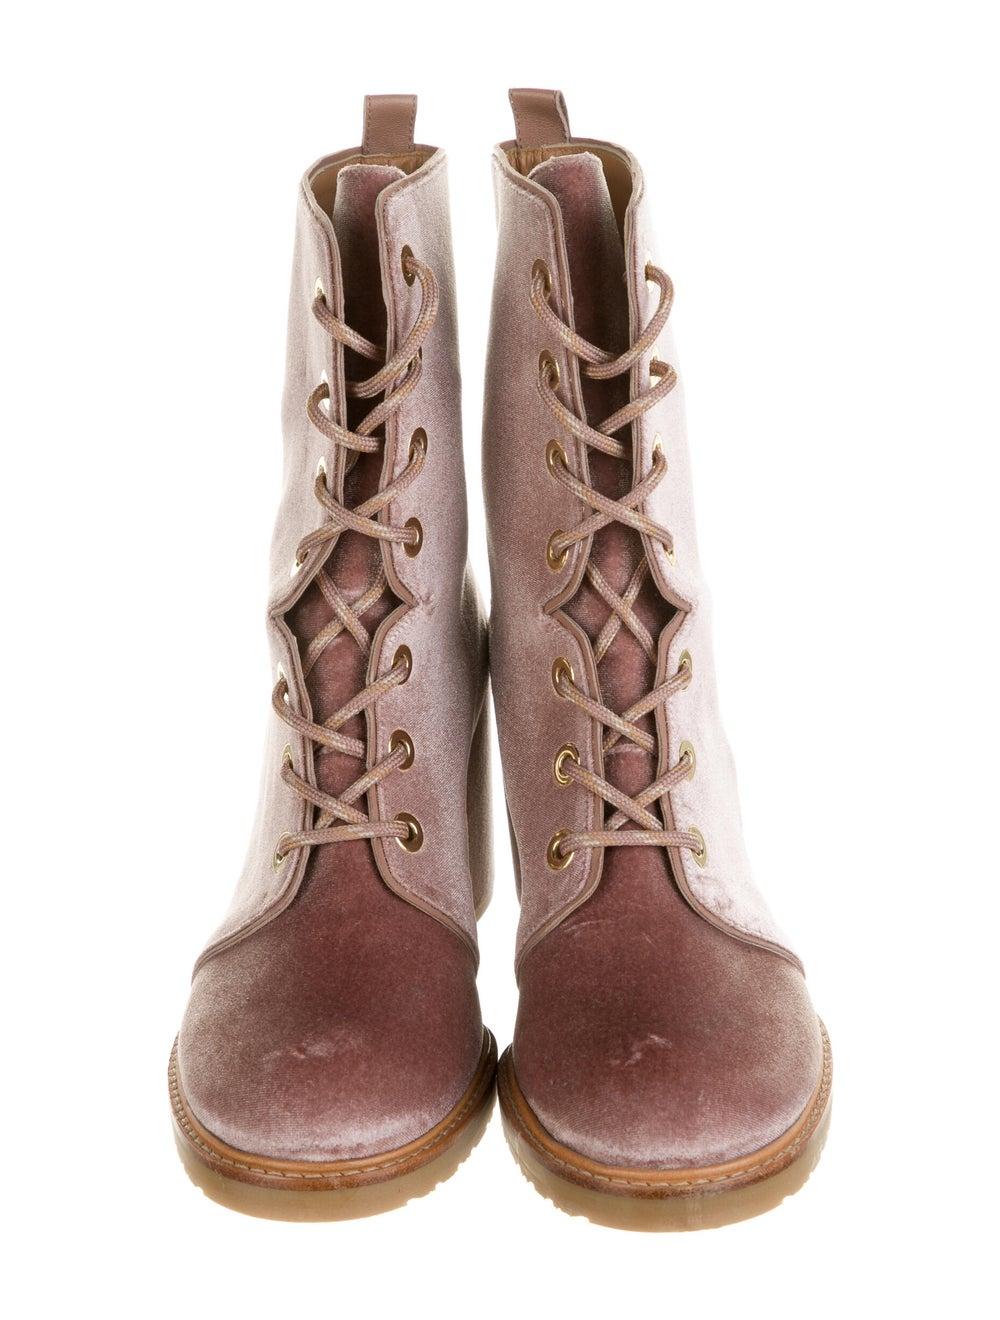 Stuart Weitzman Lace-Up Boots Pink - image 3